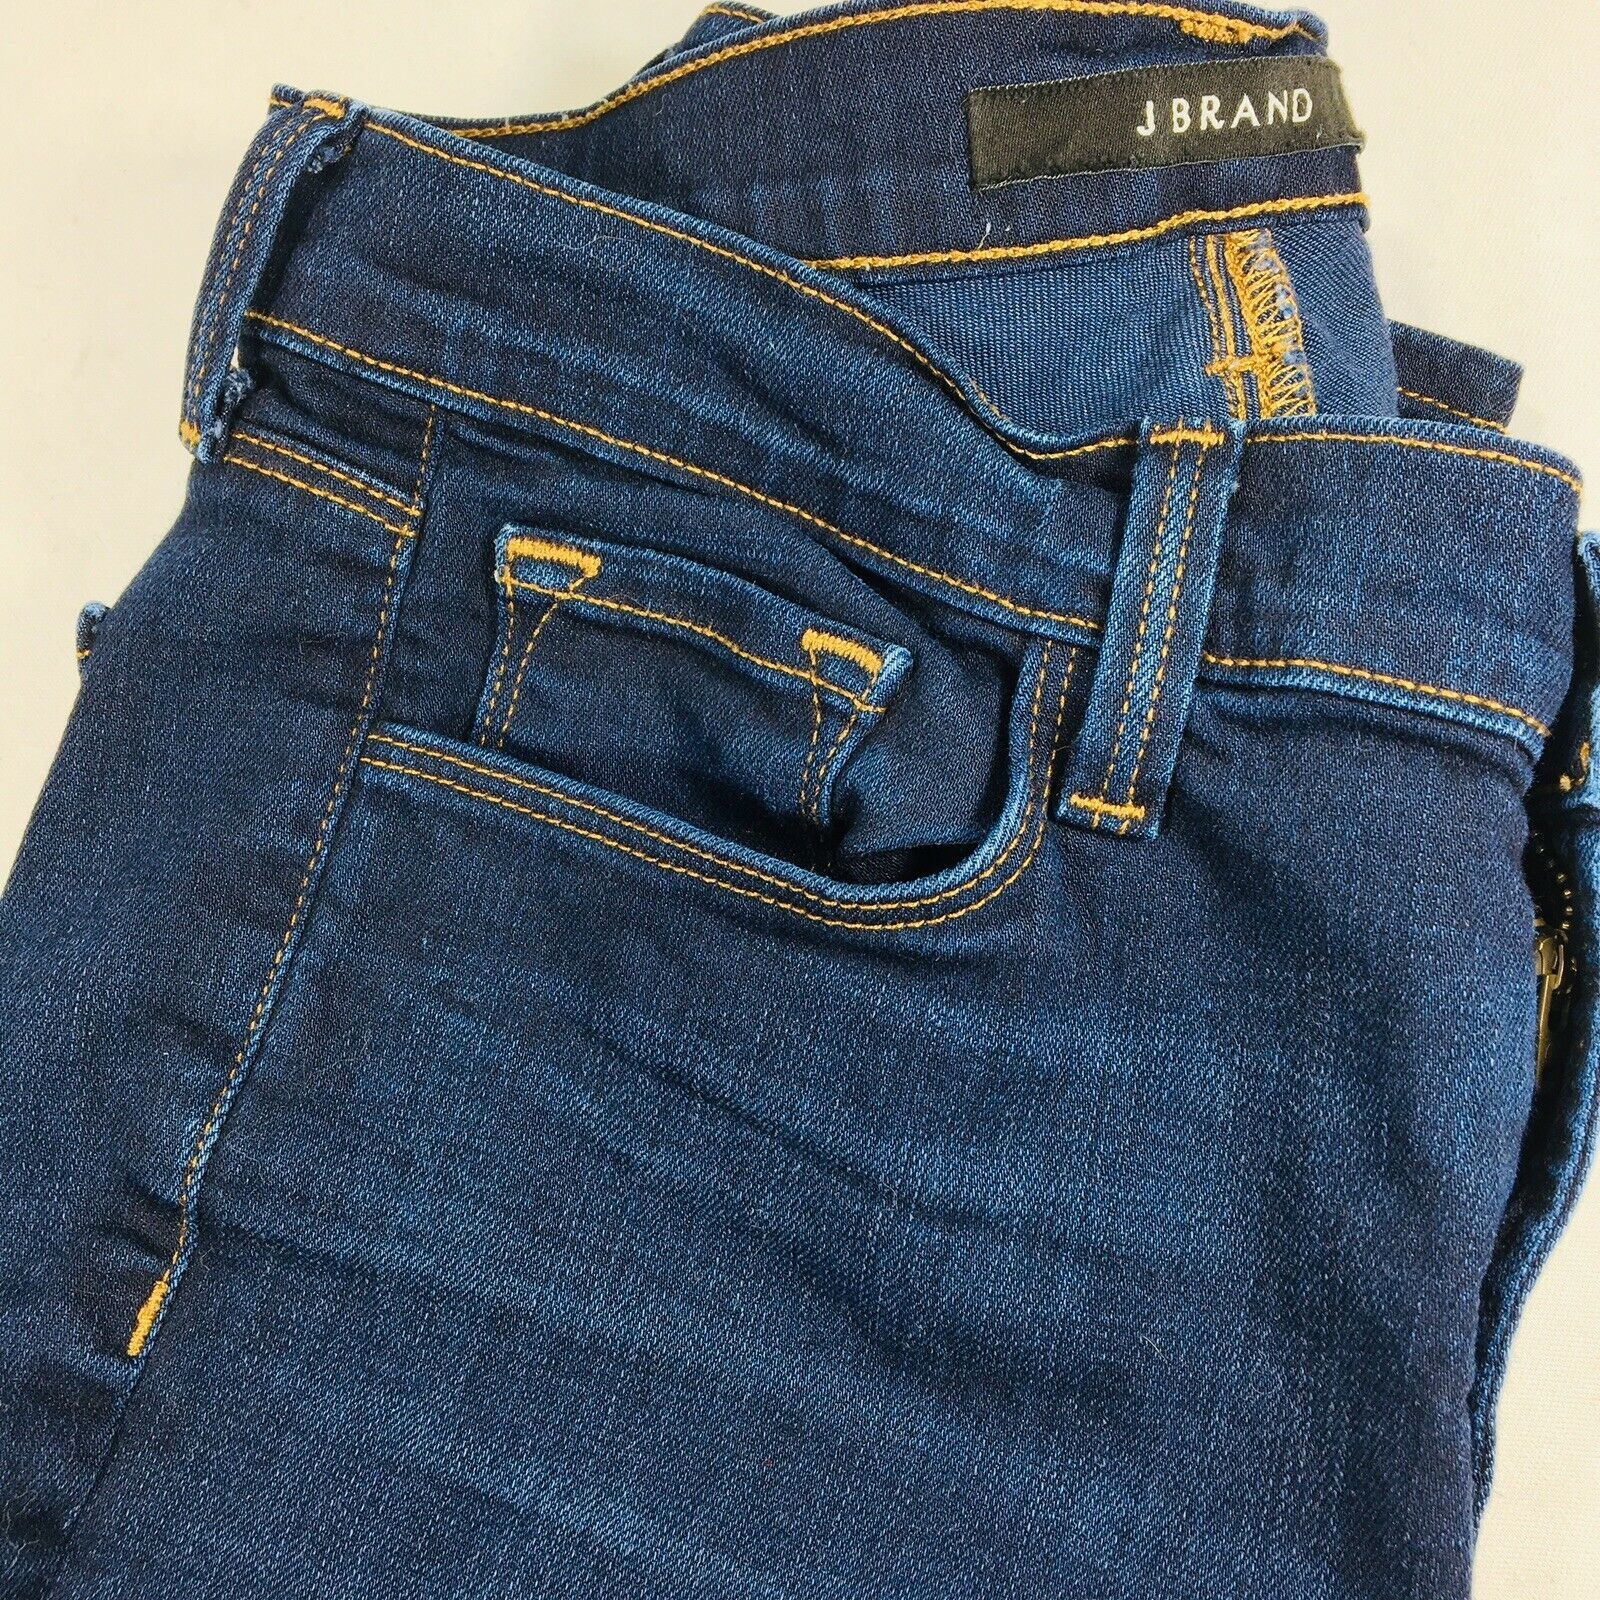 J Brand Womens Cigarette Leg Ignite Slim Straight Leg Cotton Stretch Size 28x31 image 10